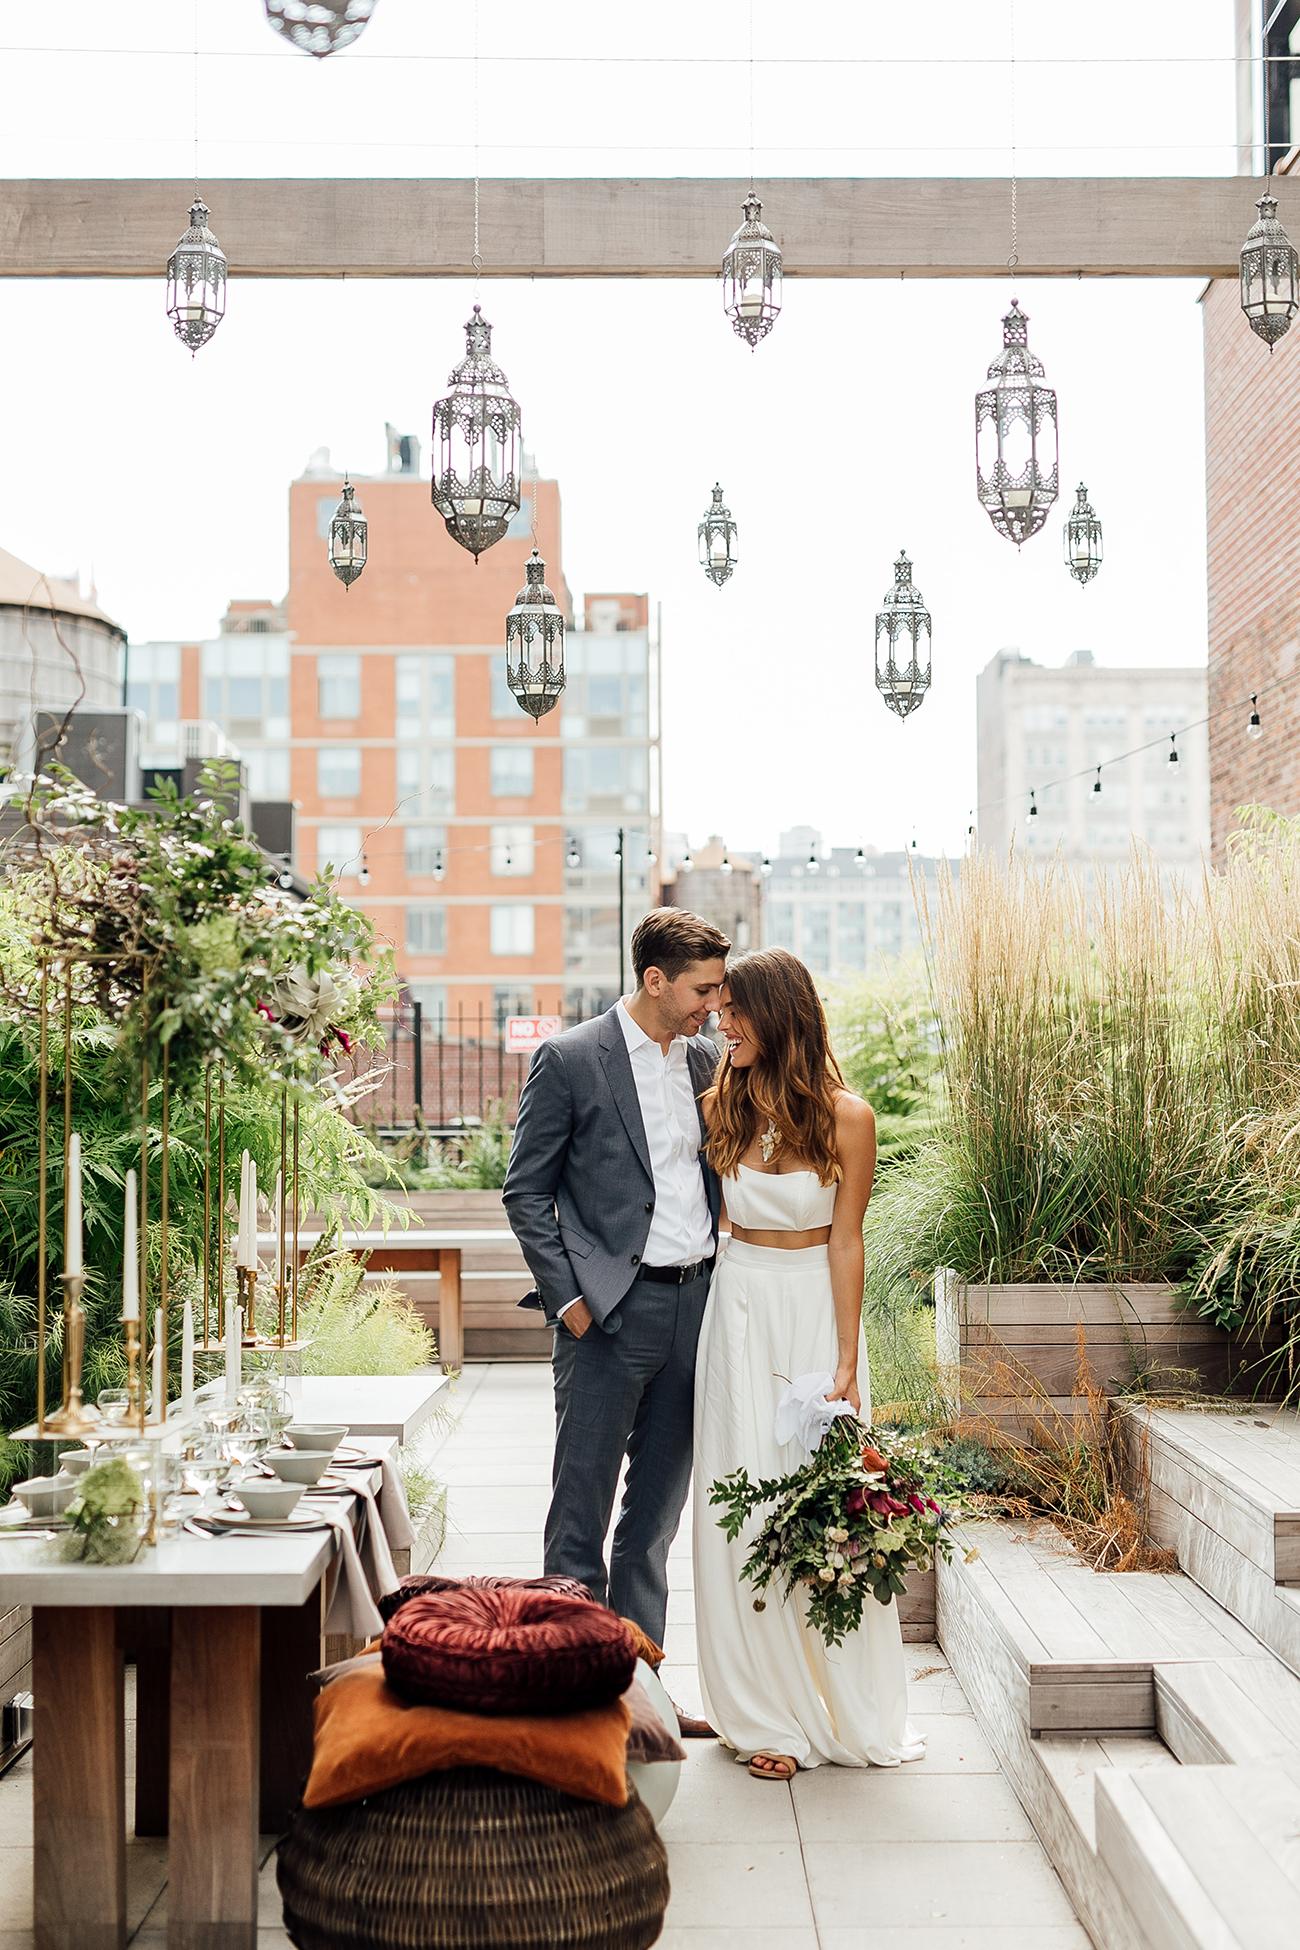 Ethical Eco-Friendly Wedding